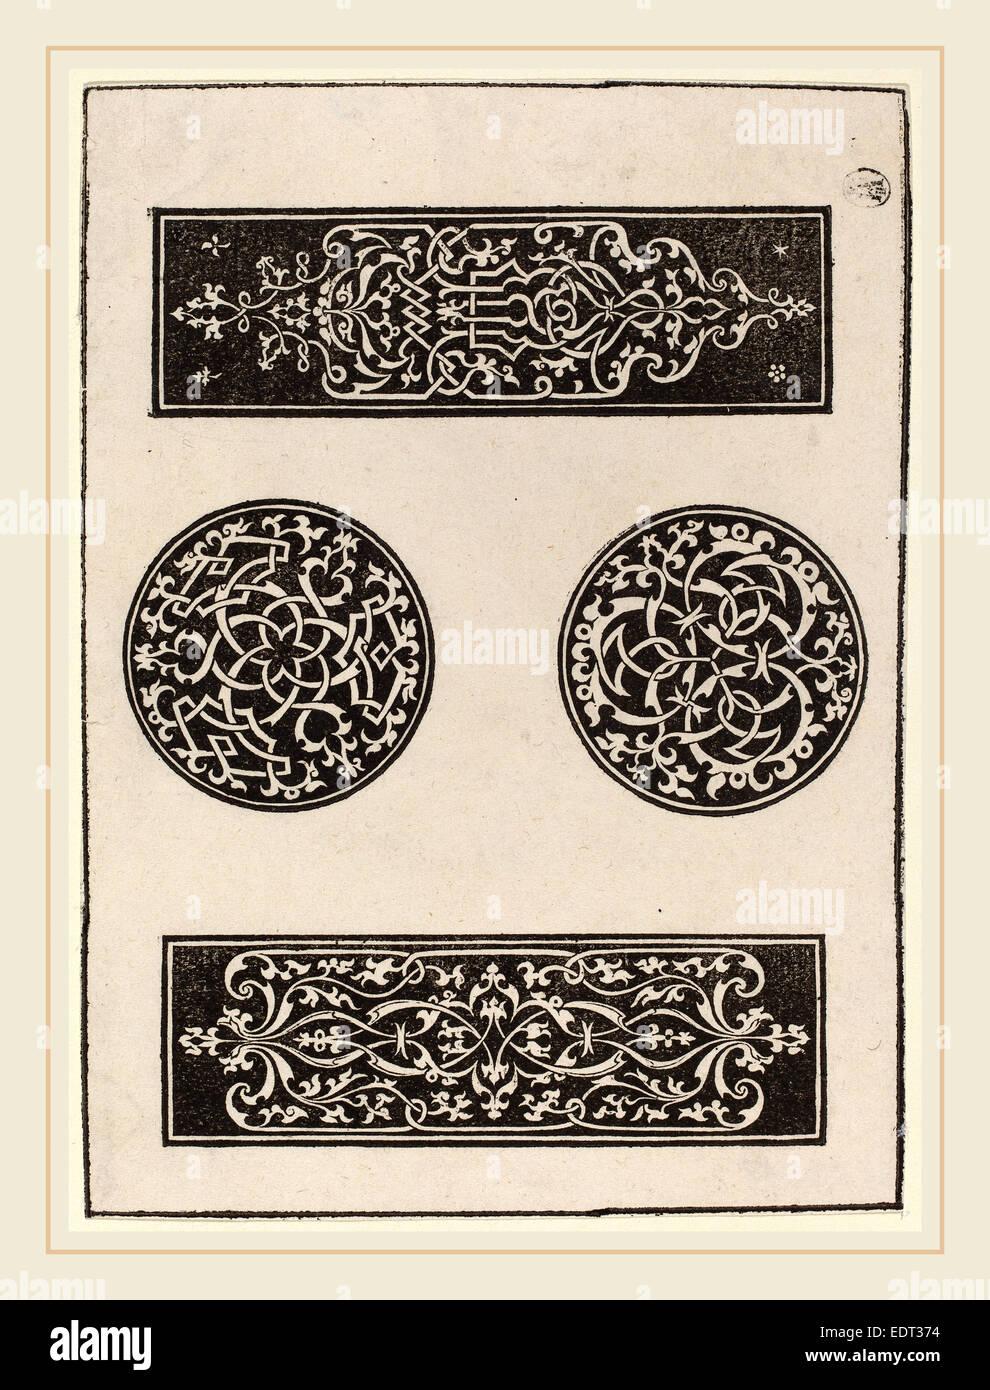 Peter Flötner, Decorative Panels, German, c. 1485-1546, 1546, woodcut - Stock Image